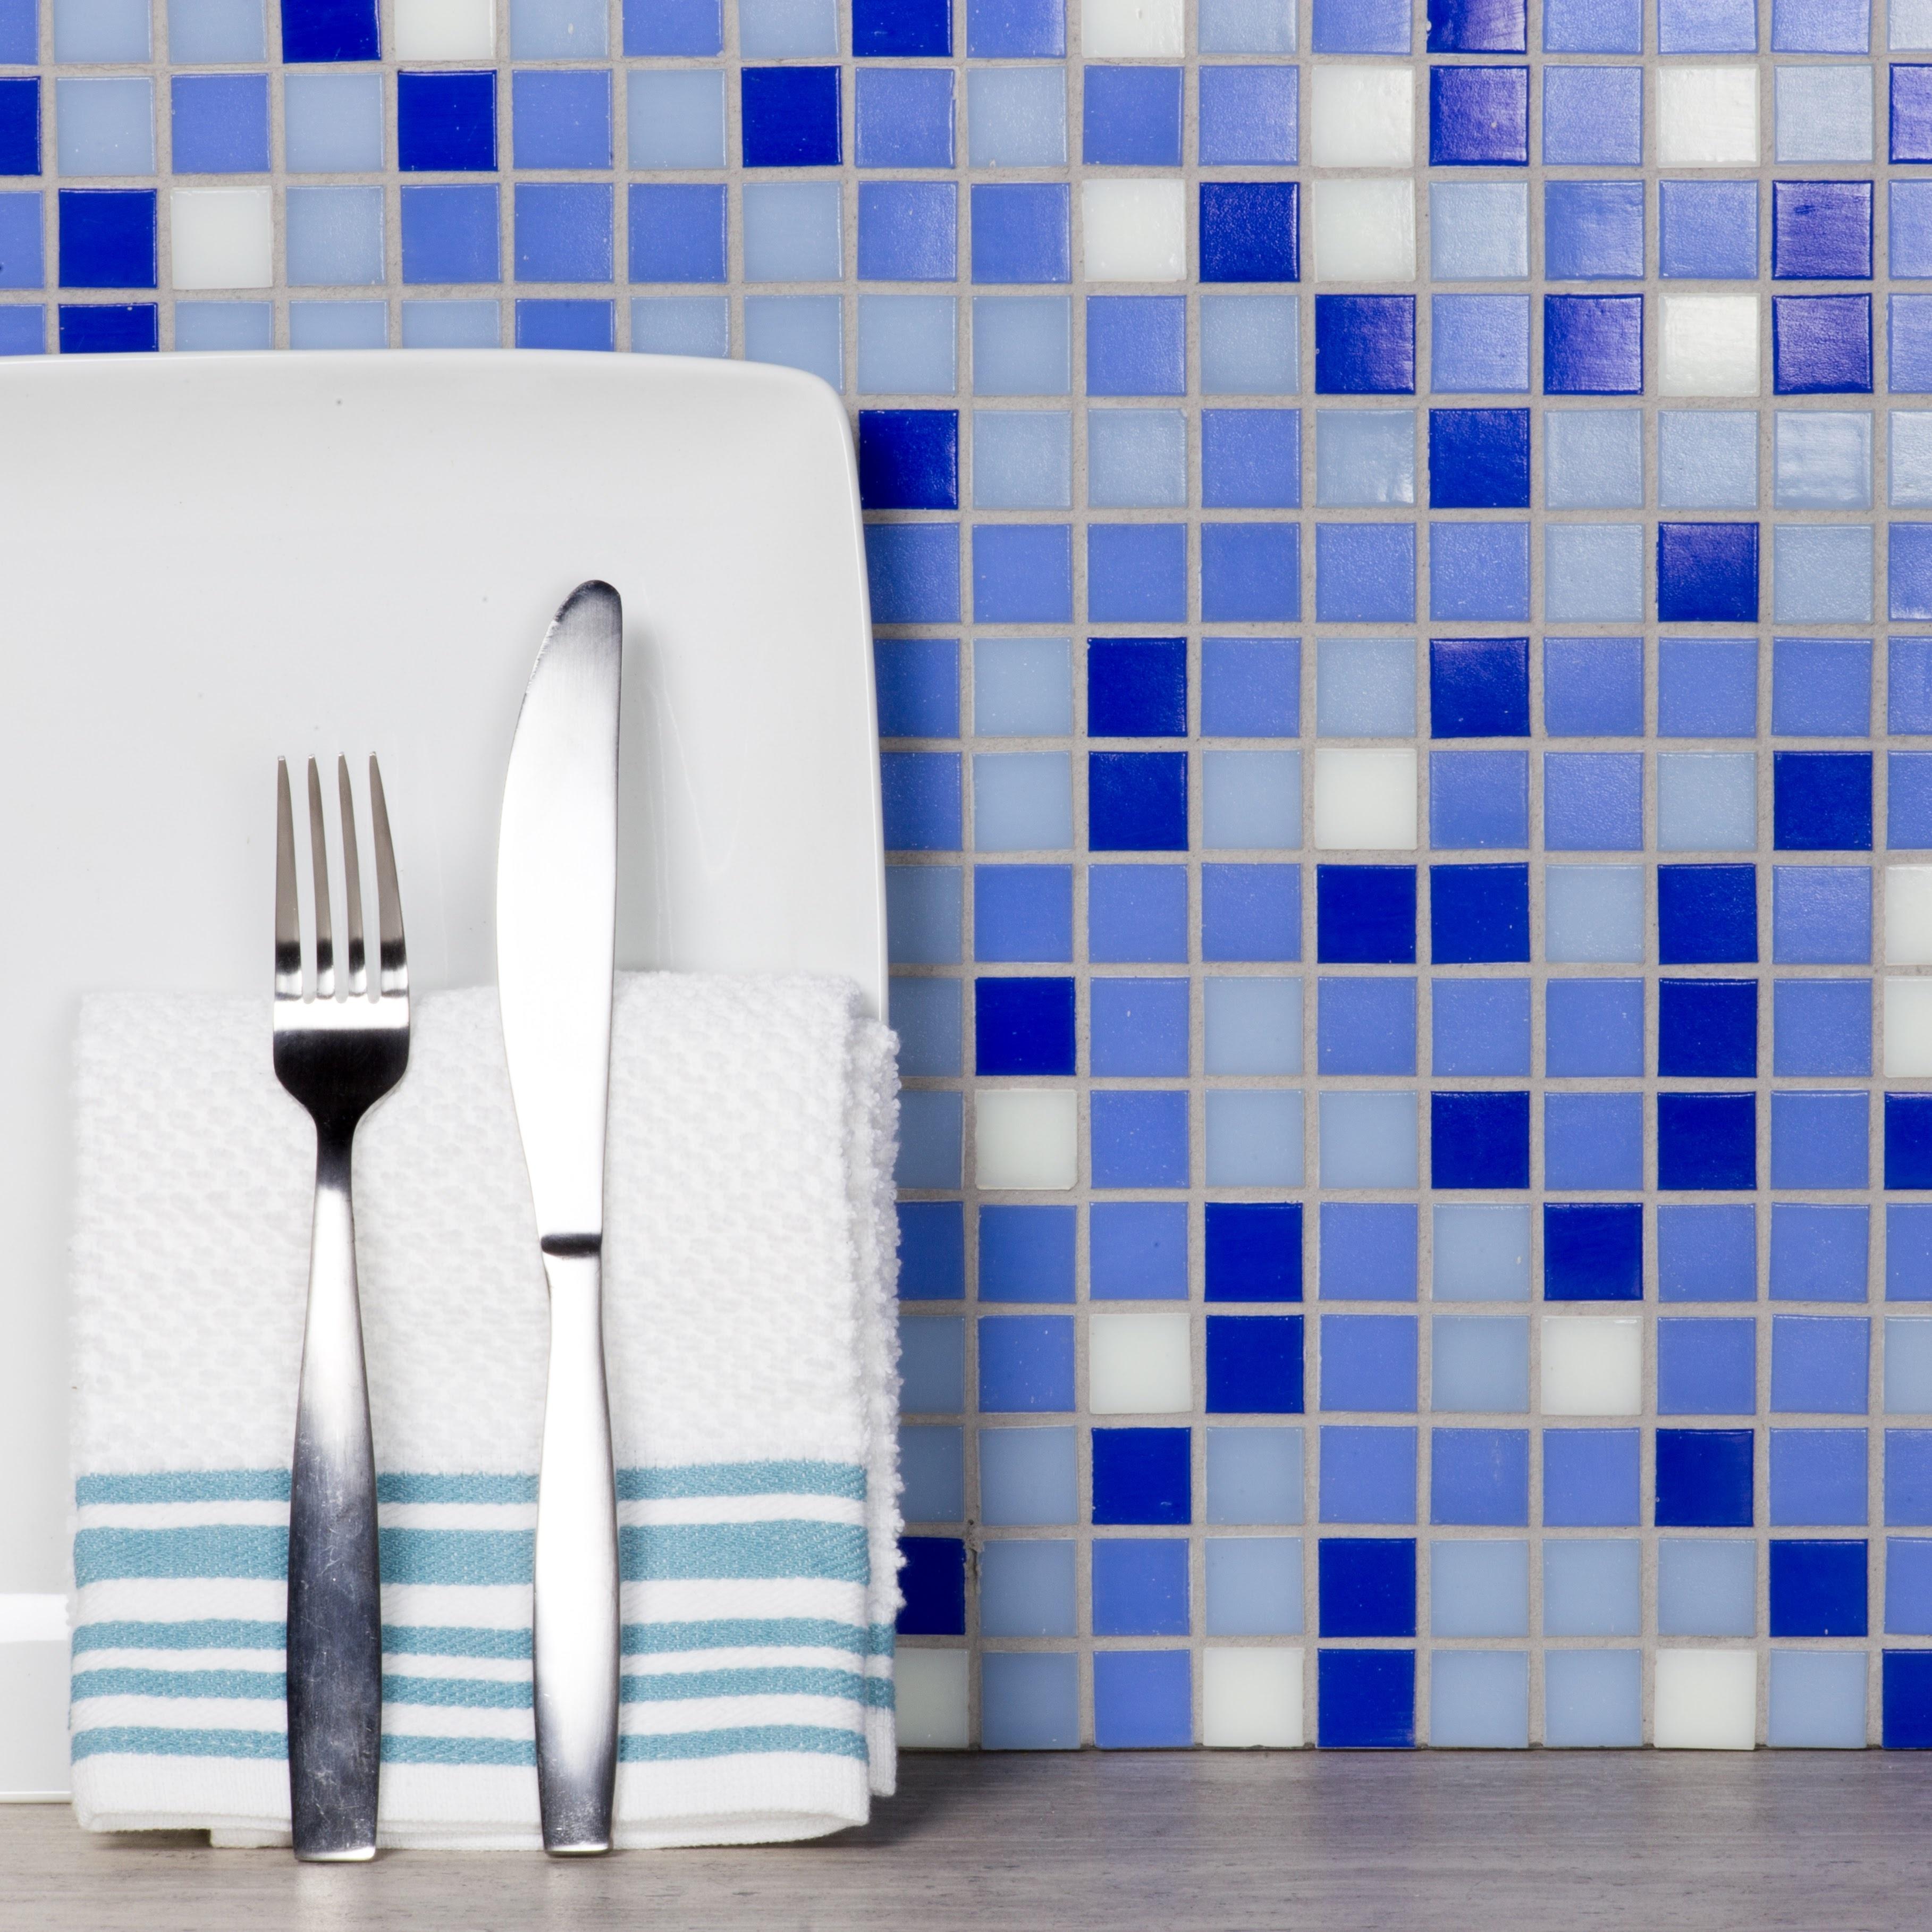 "Swimming Pool 0.75"" x 0.75"" Semi-Gloss Blue Glass Square Backsplash Mosaic Wall & Floor Tile"